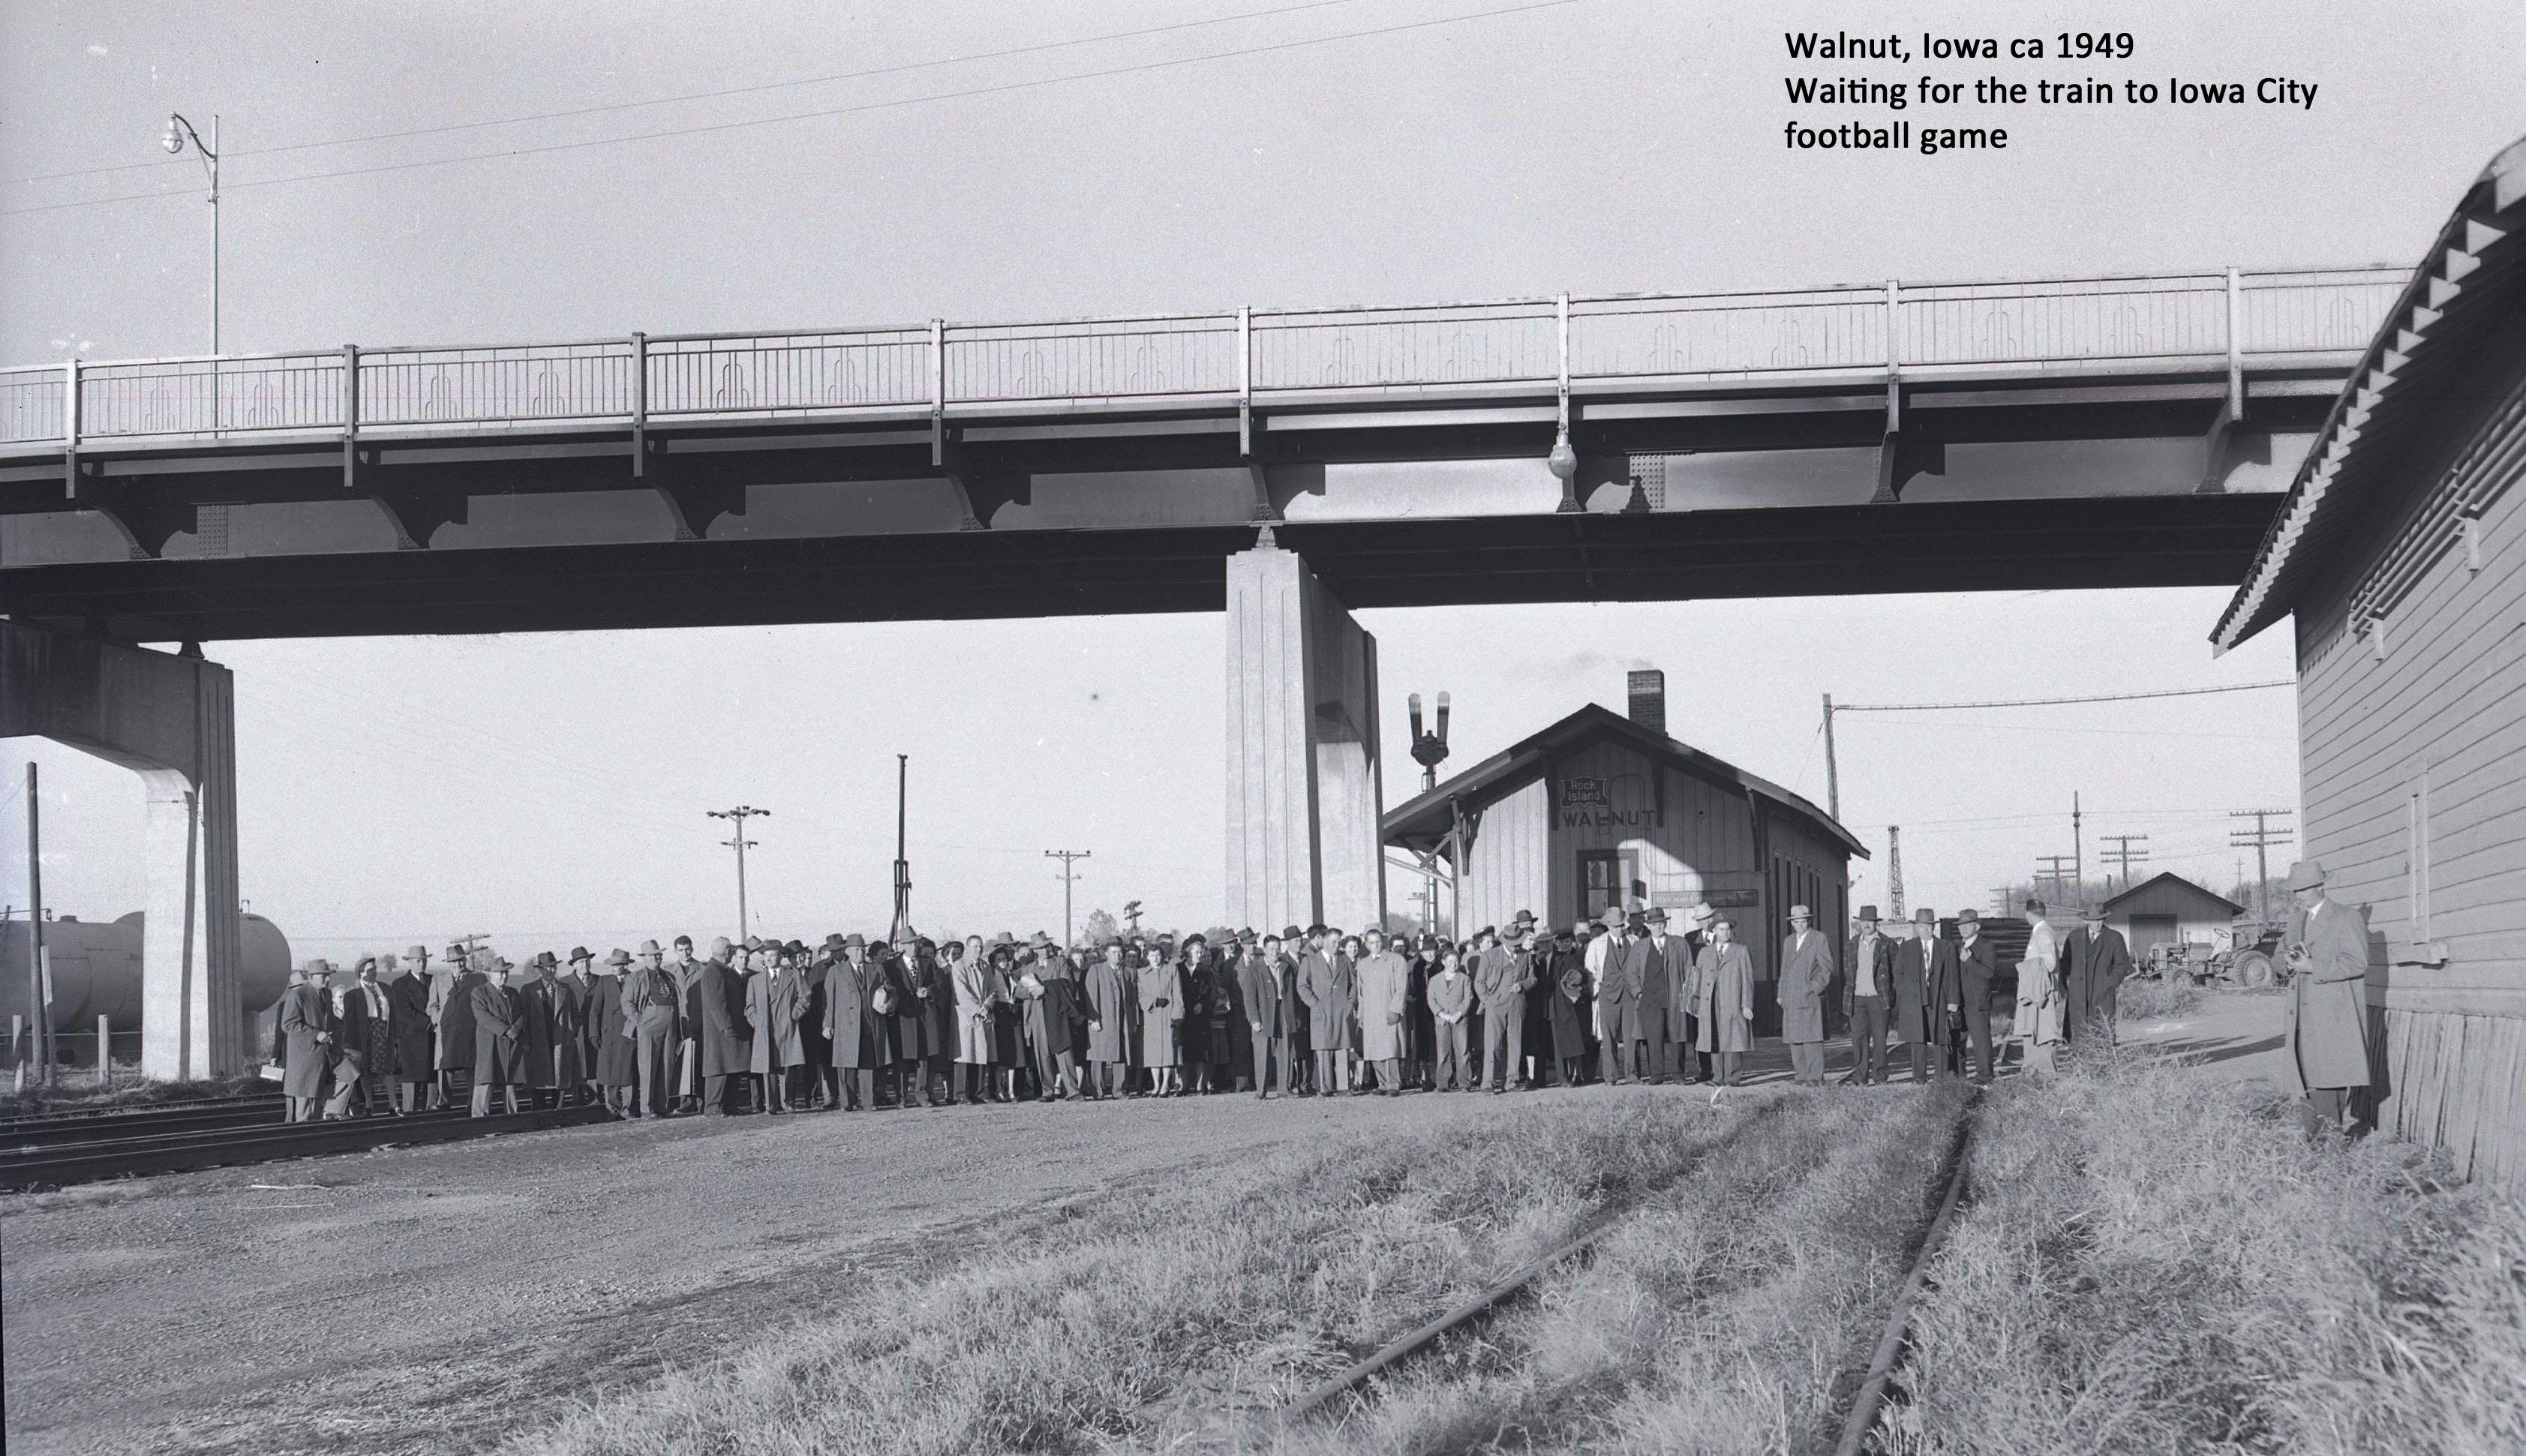 1949 football fans to Iowa City